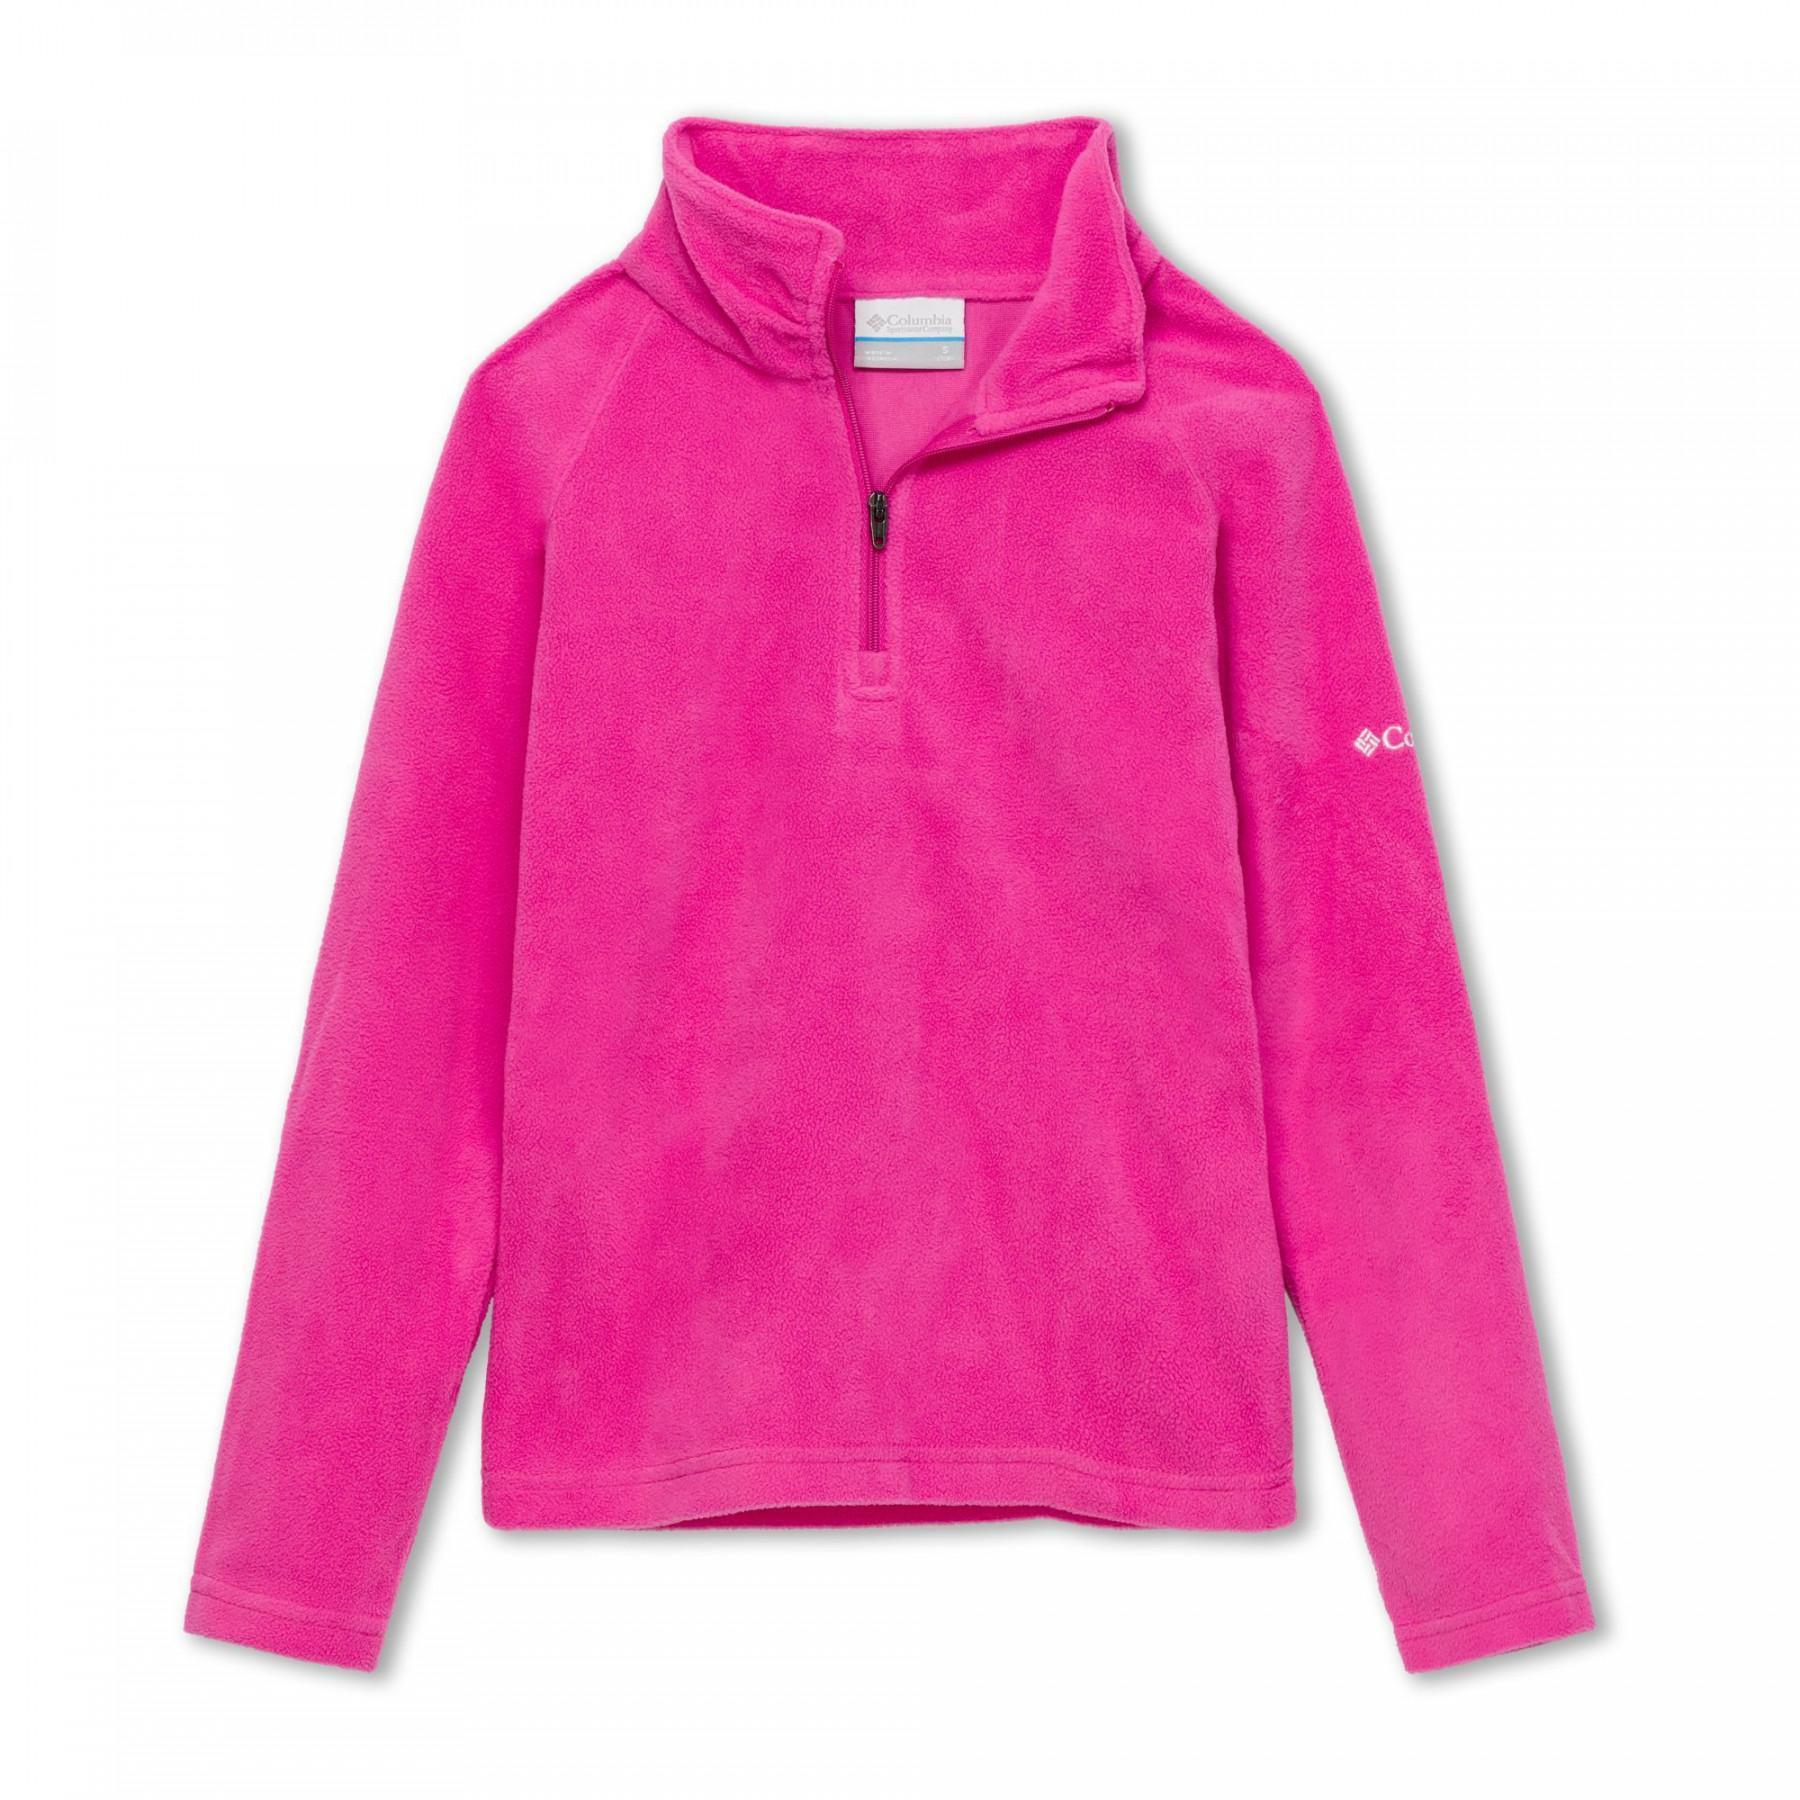 Columbia Glacial Girl's 1/2 zip sweatshirt